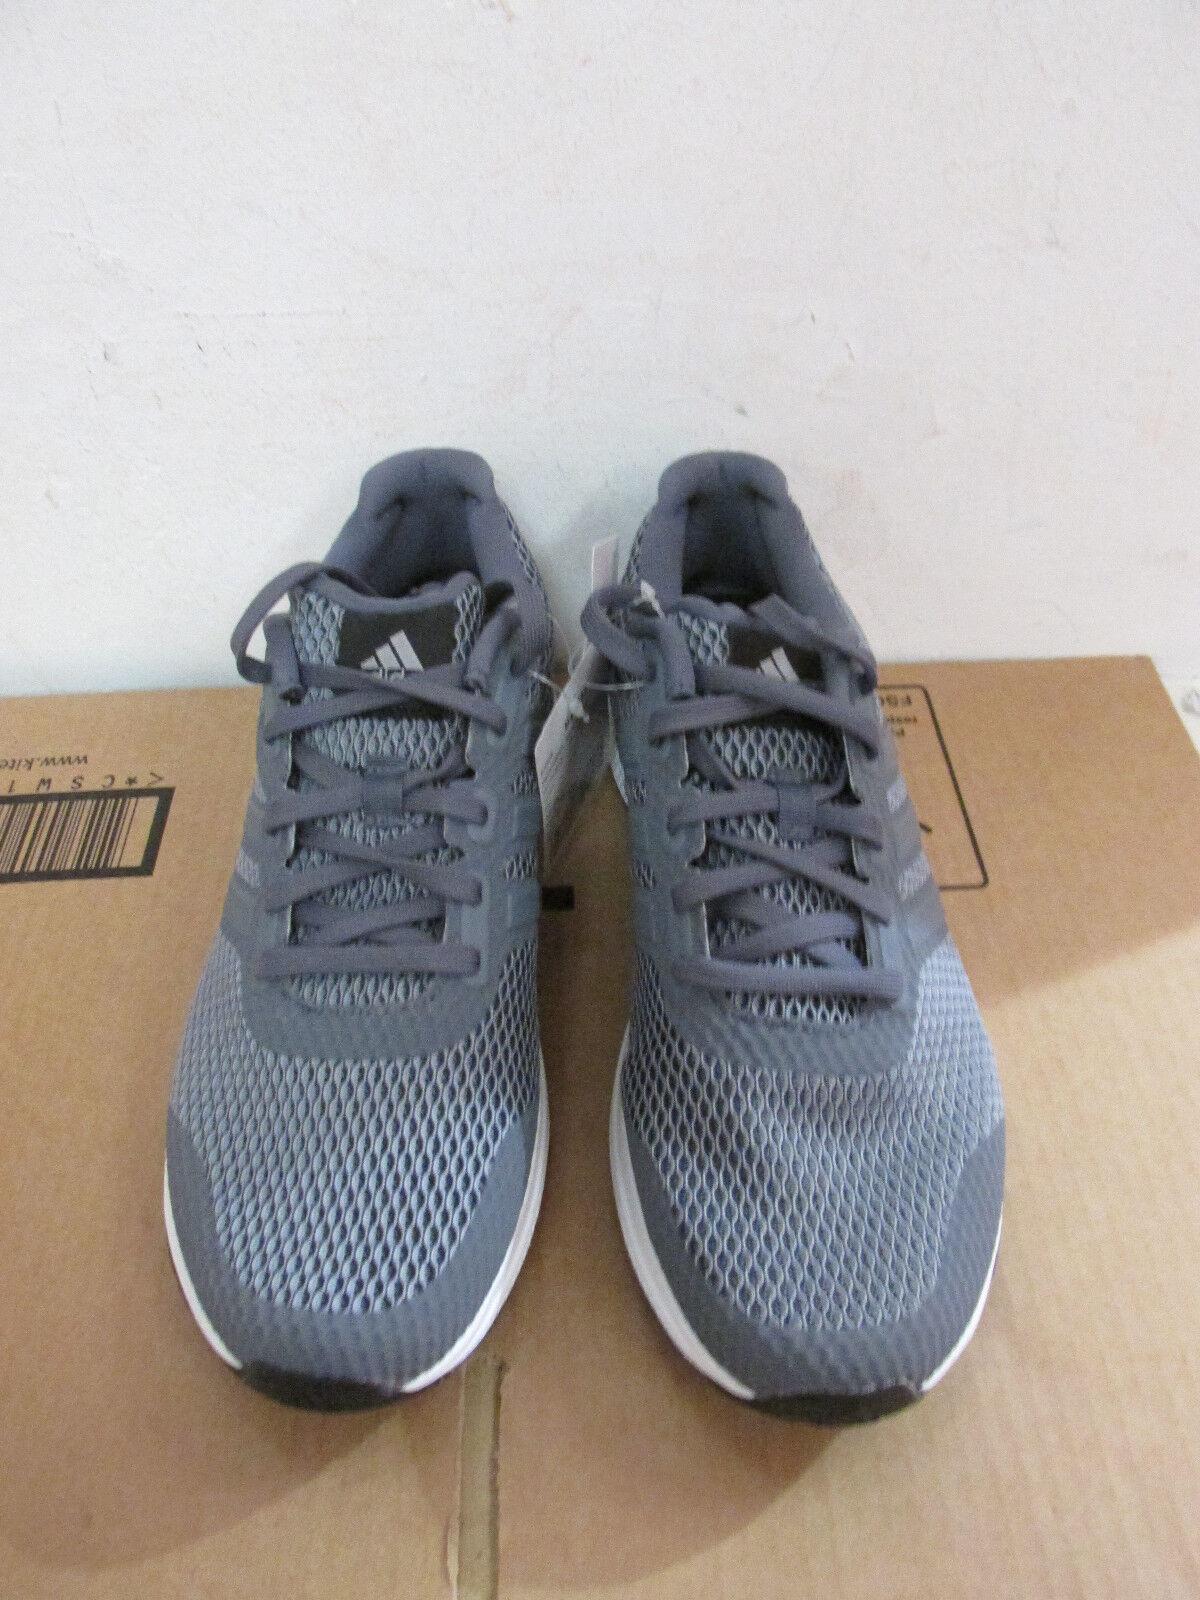 Adidas Mana Sneakers Bounce B42432 Herren Turnschuhe Sneakers Mana Probe 2ed2b2